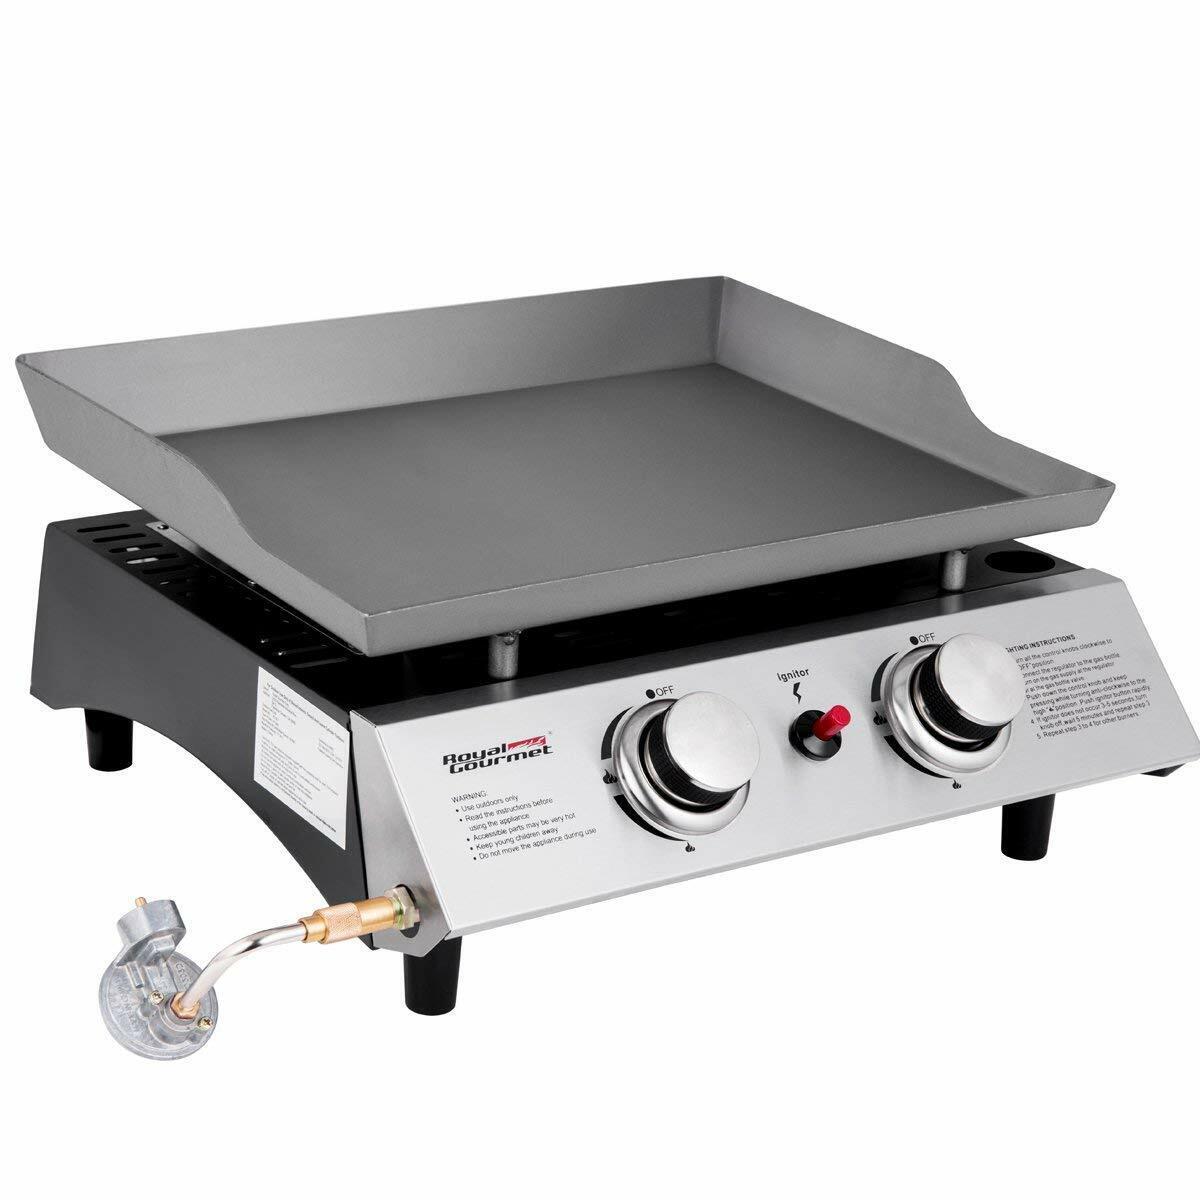 Royal Gourmet BBQ Propane Gas Grill 2 Burner Tabletop Campin